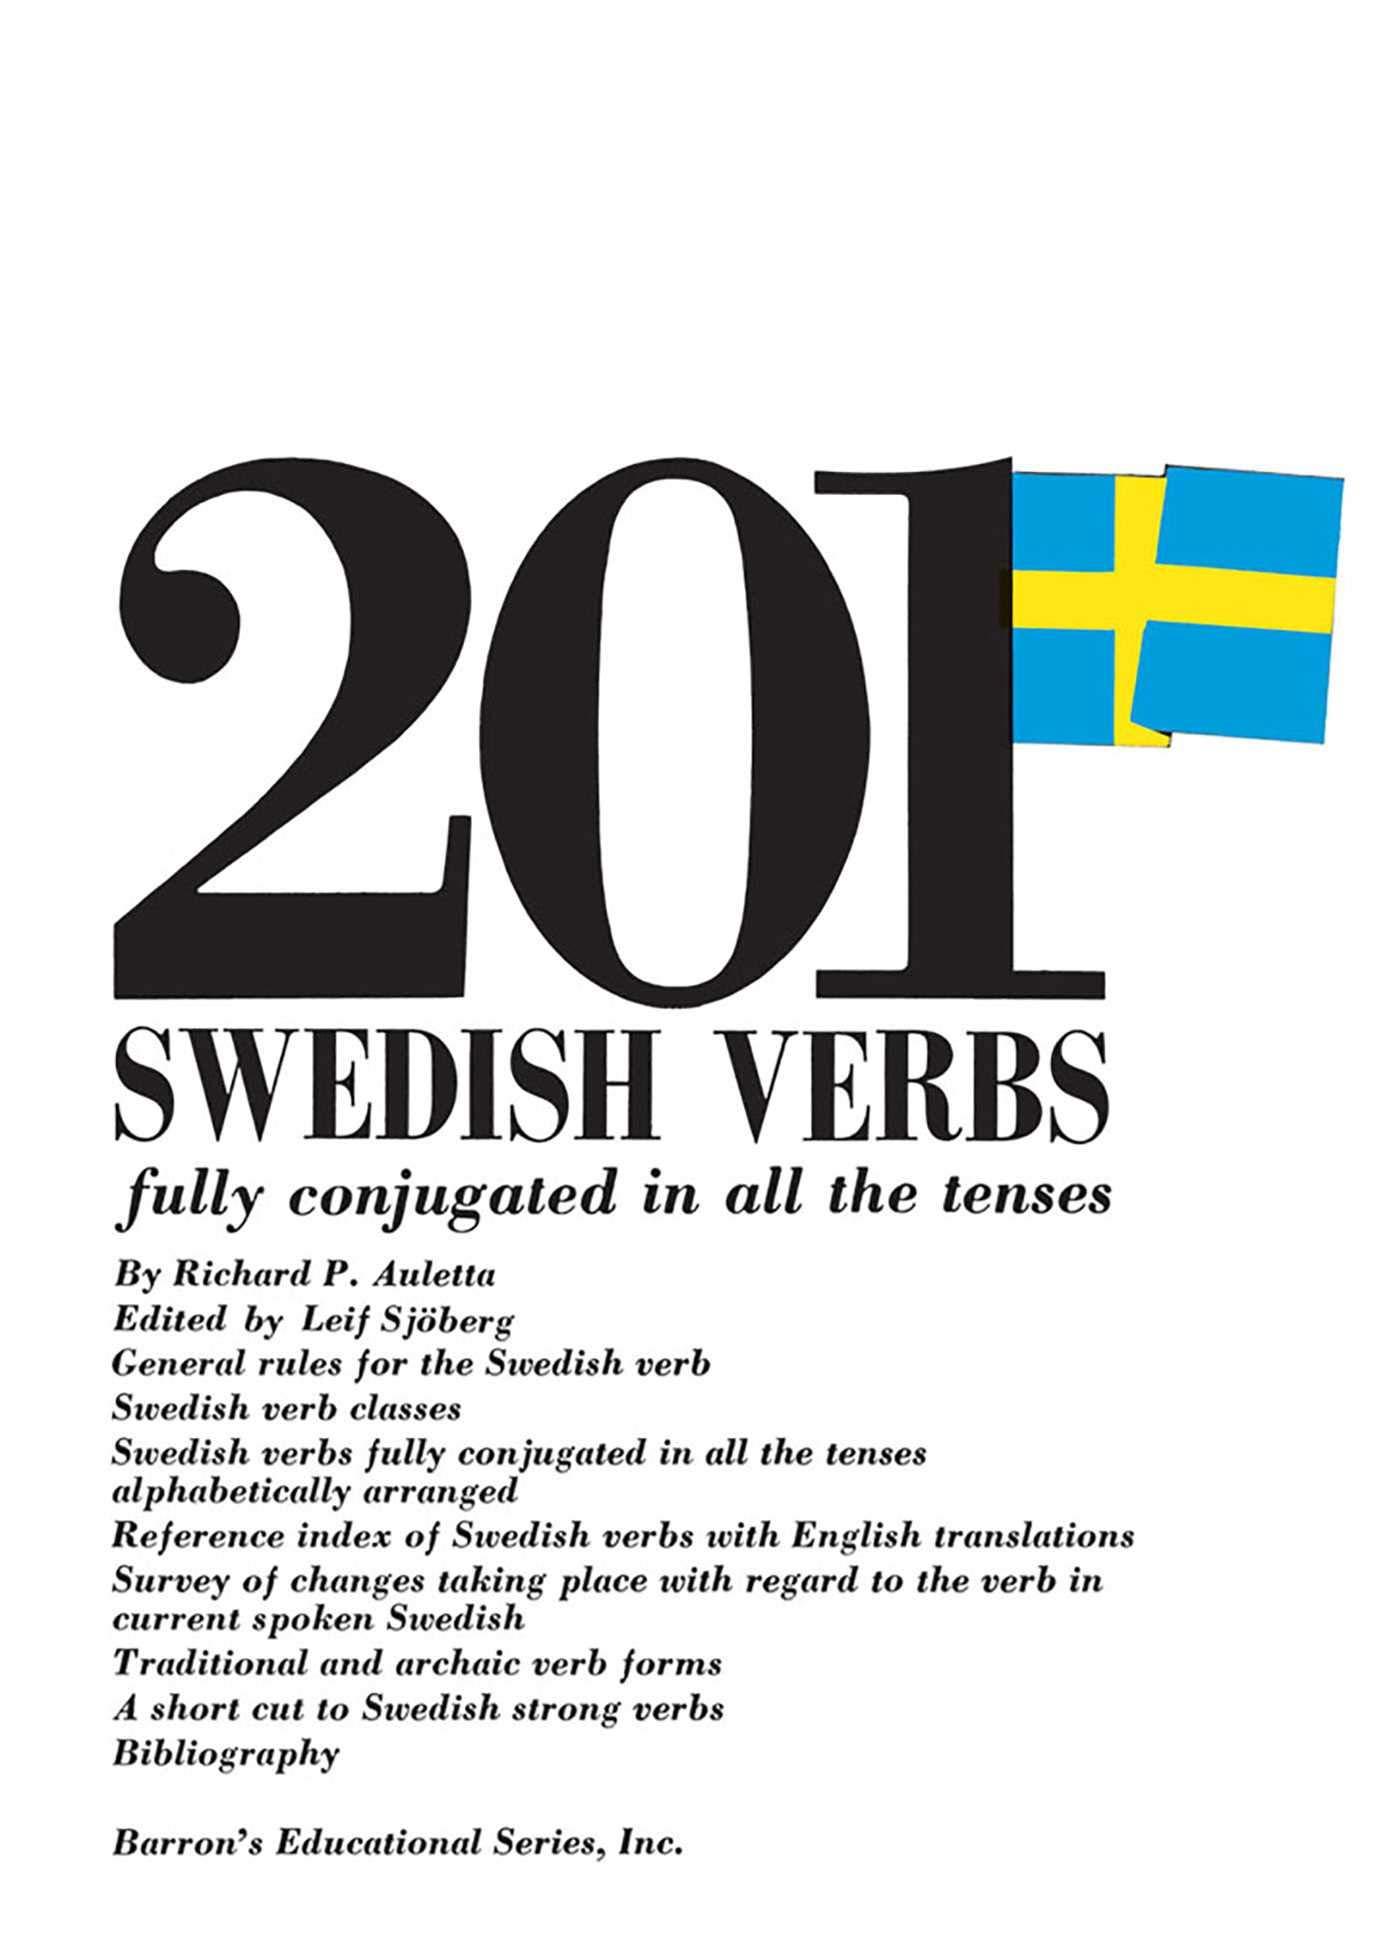 201 Swedish Verbs: Fully Conjugated in All the Tenses: Richard Auletta,  Leif Sjoberg: 9780812005288: Books - Amazon.ca